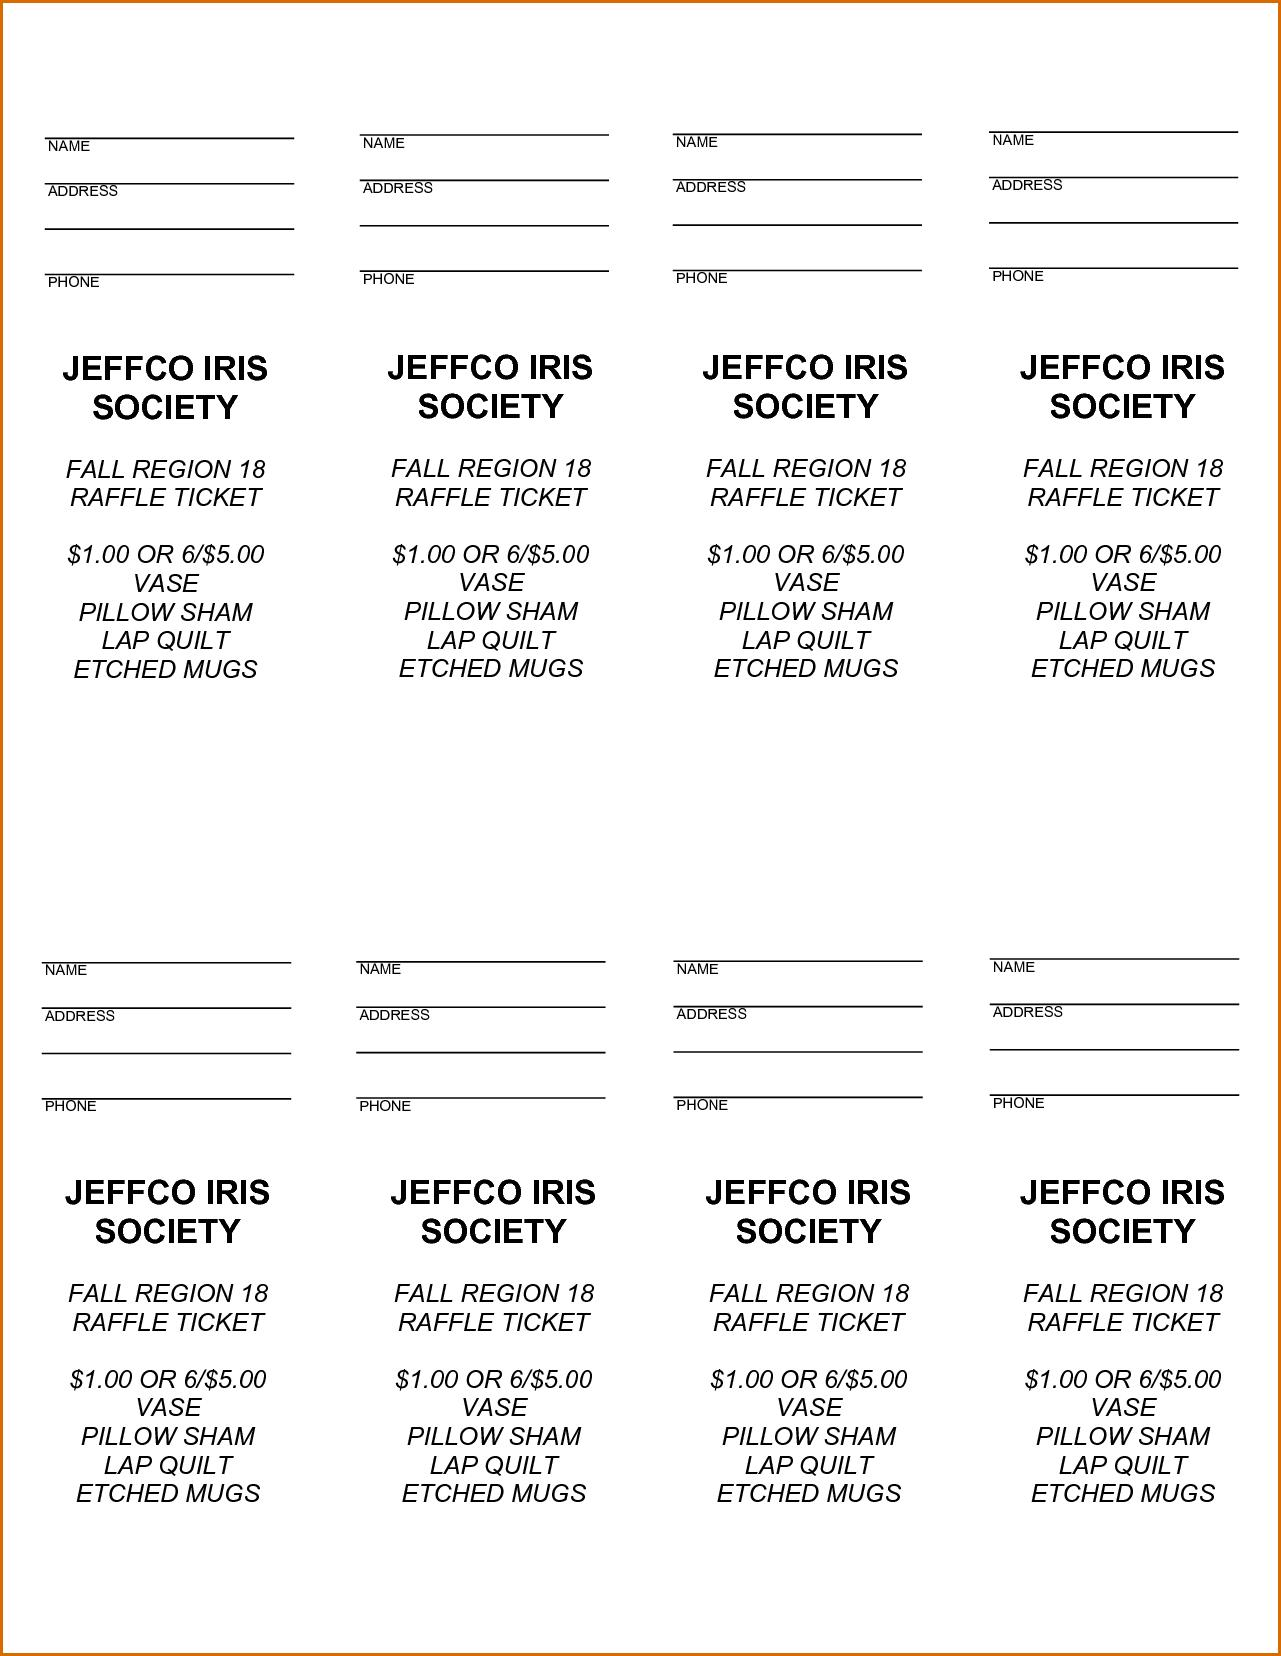 Free Printable Raffle Tickets - Free Printable Raffle Ticket - Free Printable Raffle Ticket Template